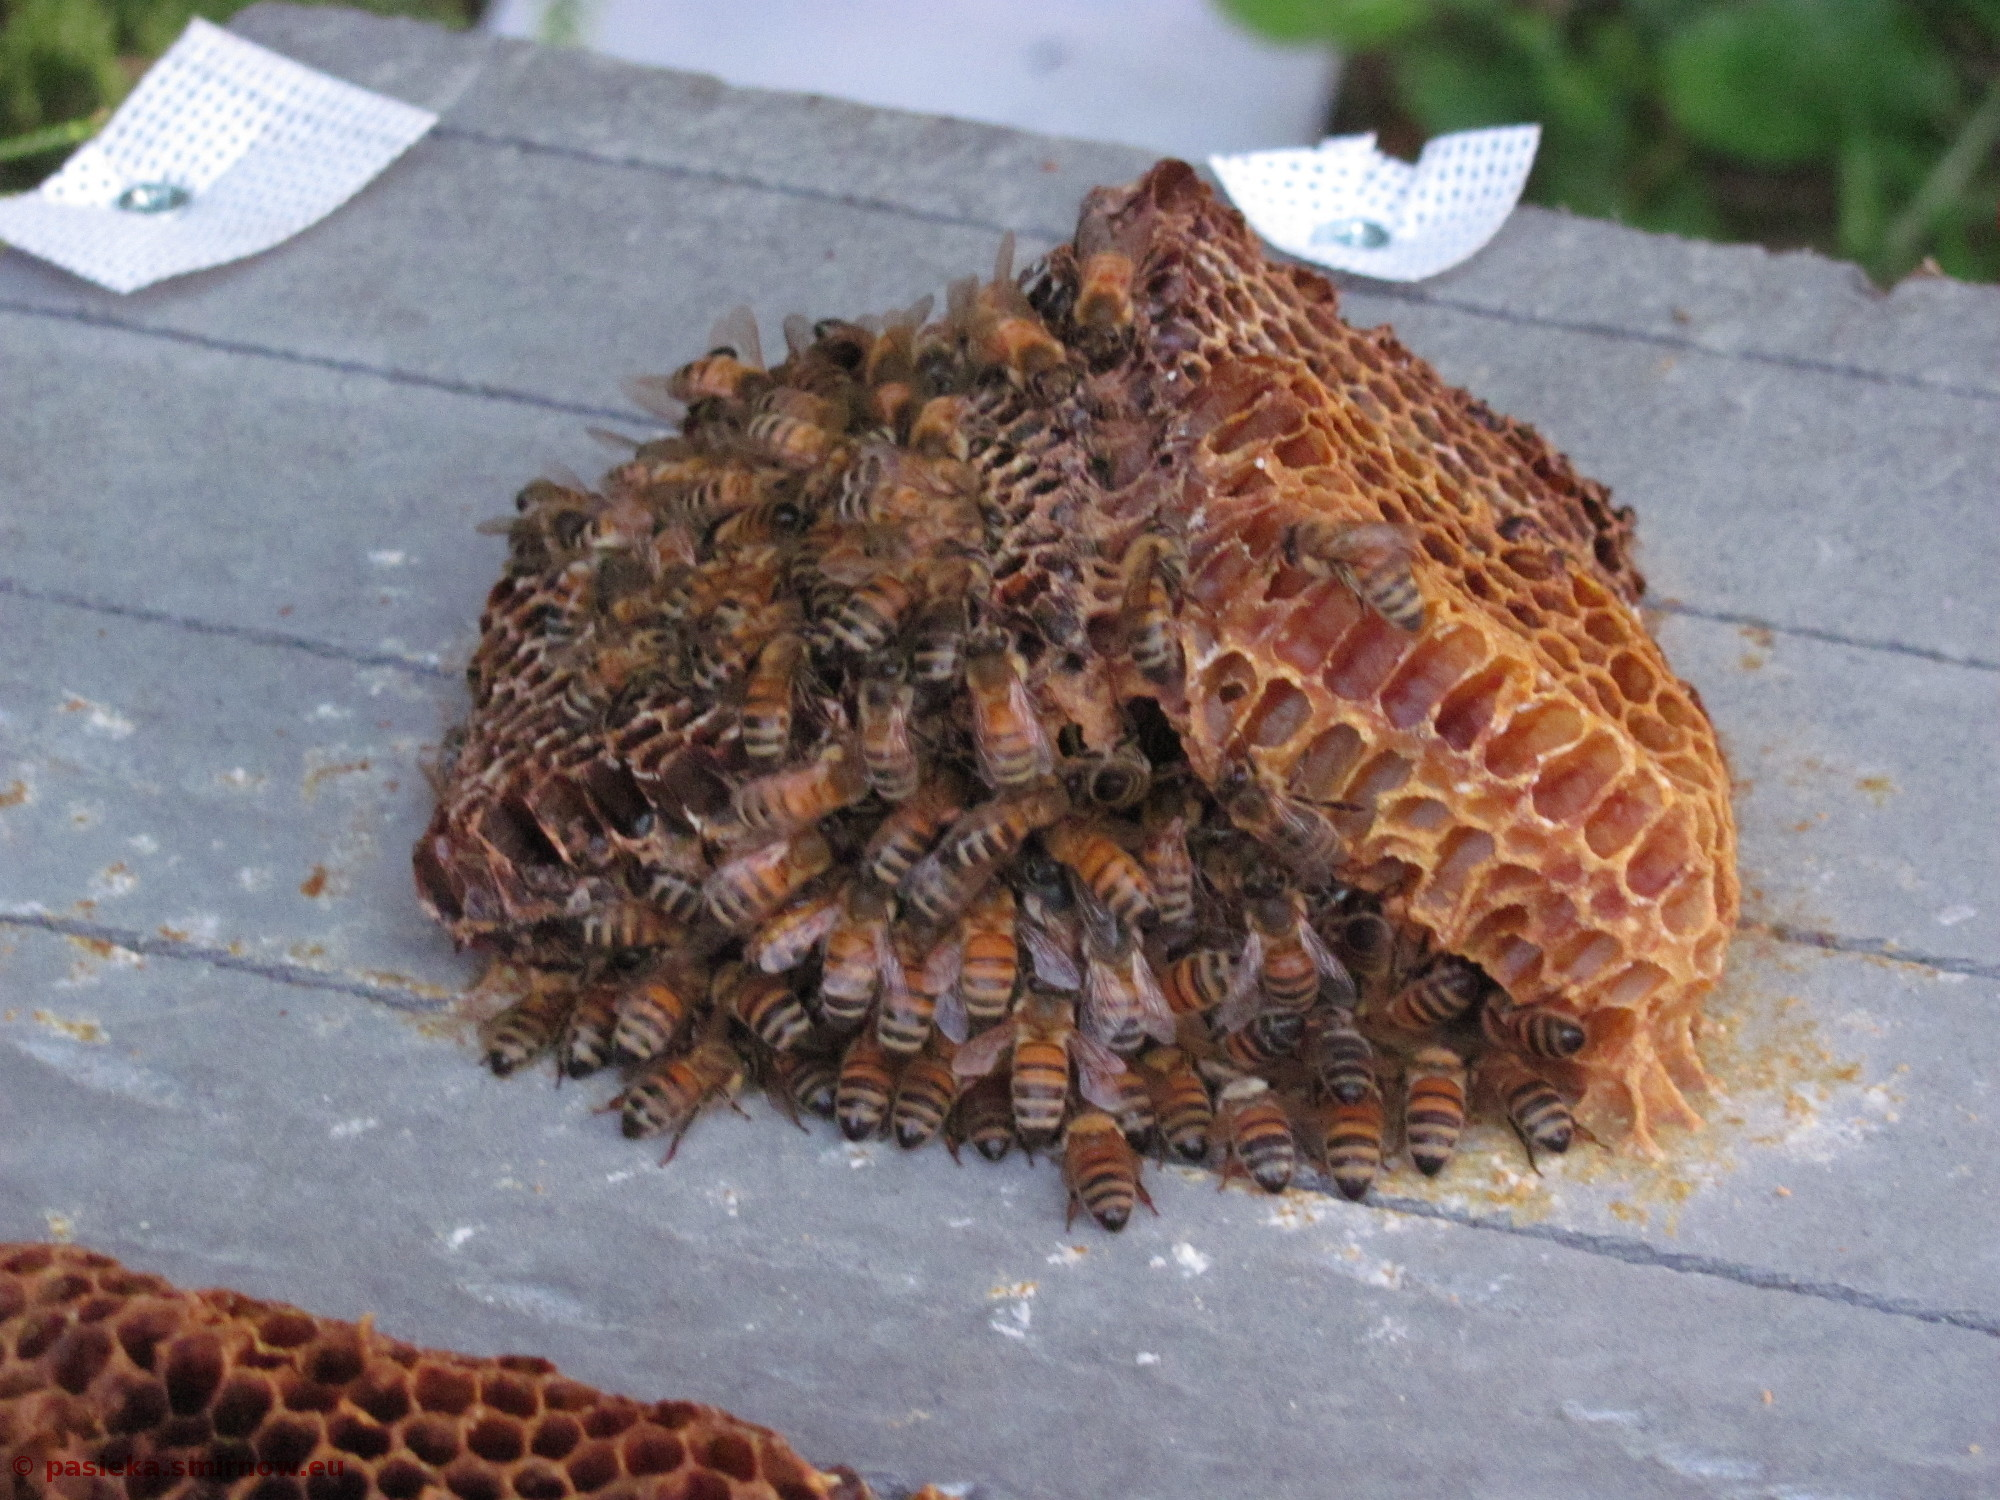 Kłębik pszczół spędził noc pod namiotem